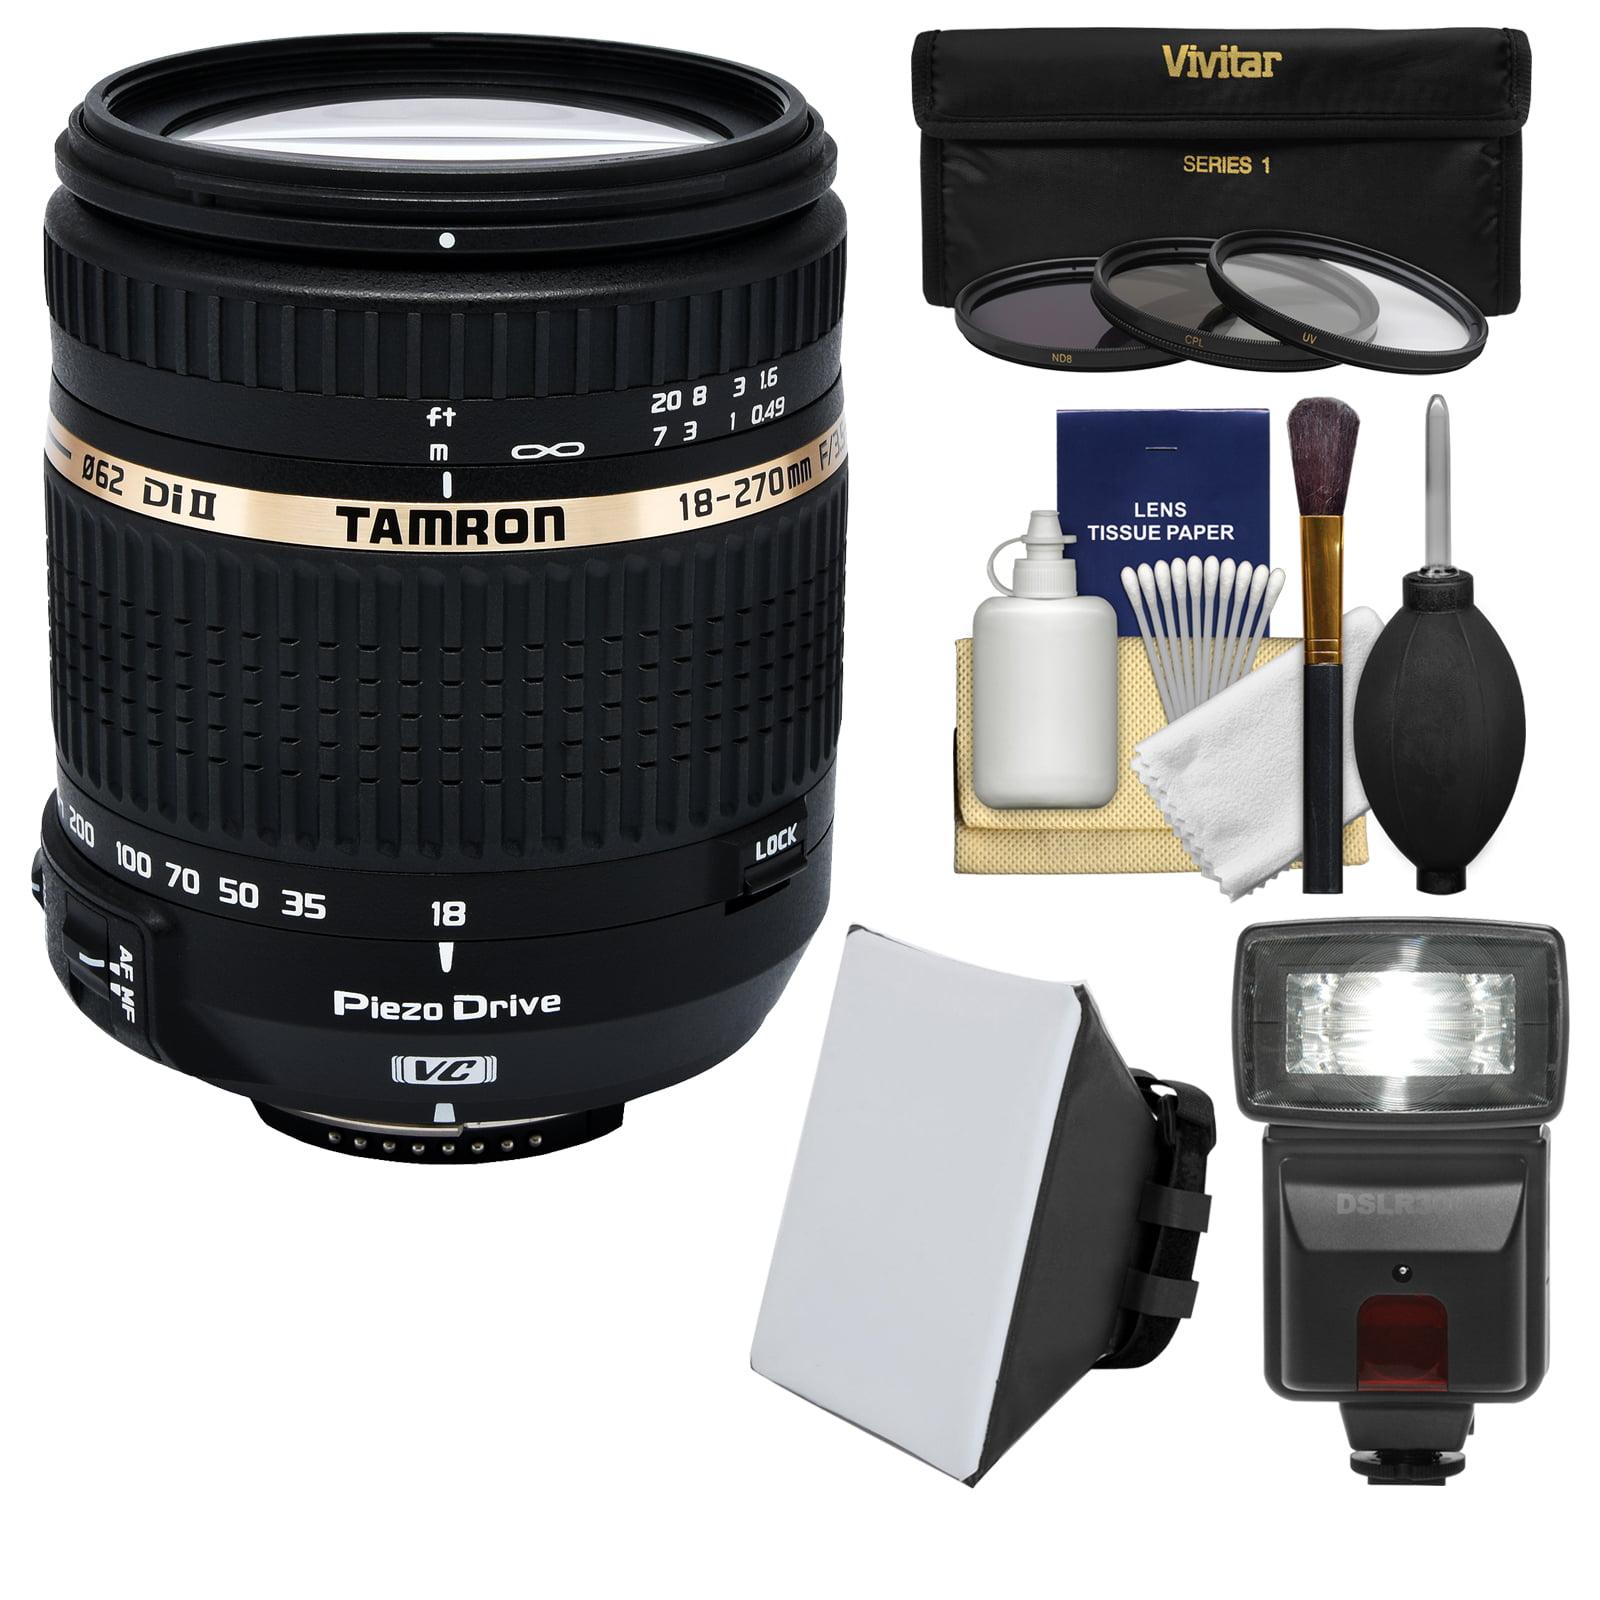 Tamron 18-270mm f/3.5-6.3 Di II VC PZD Macro Zoom Lens (B...